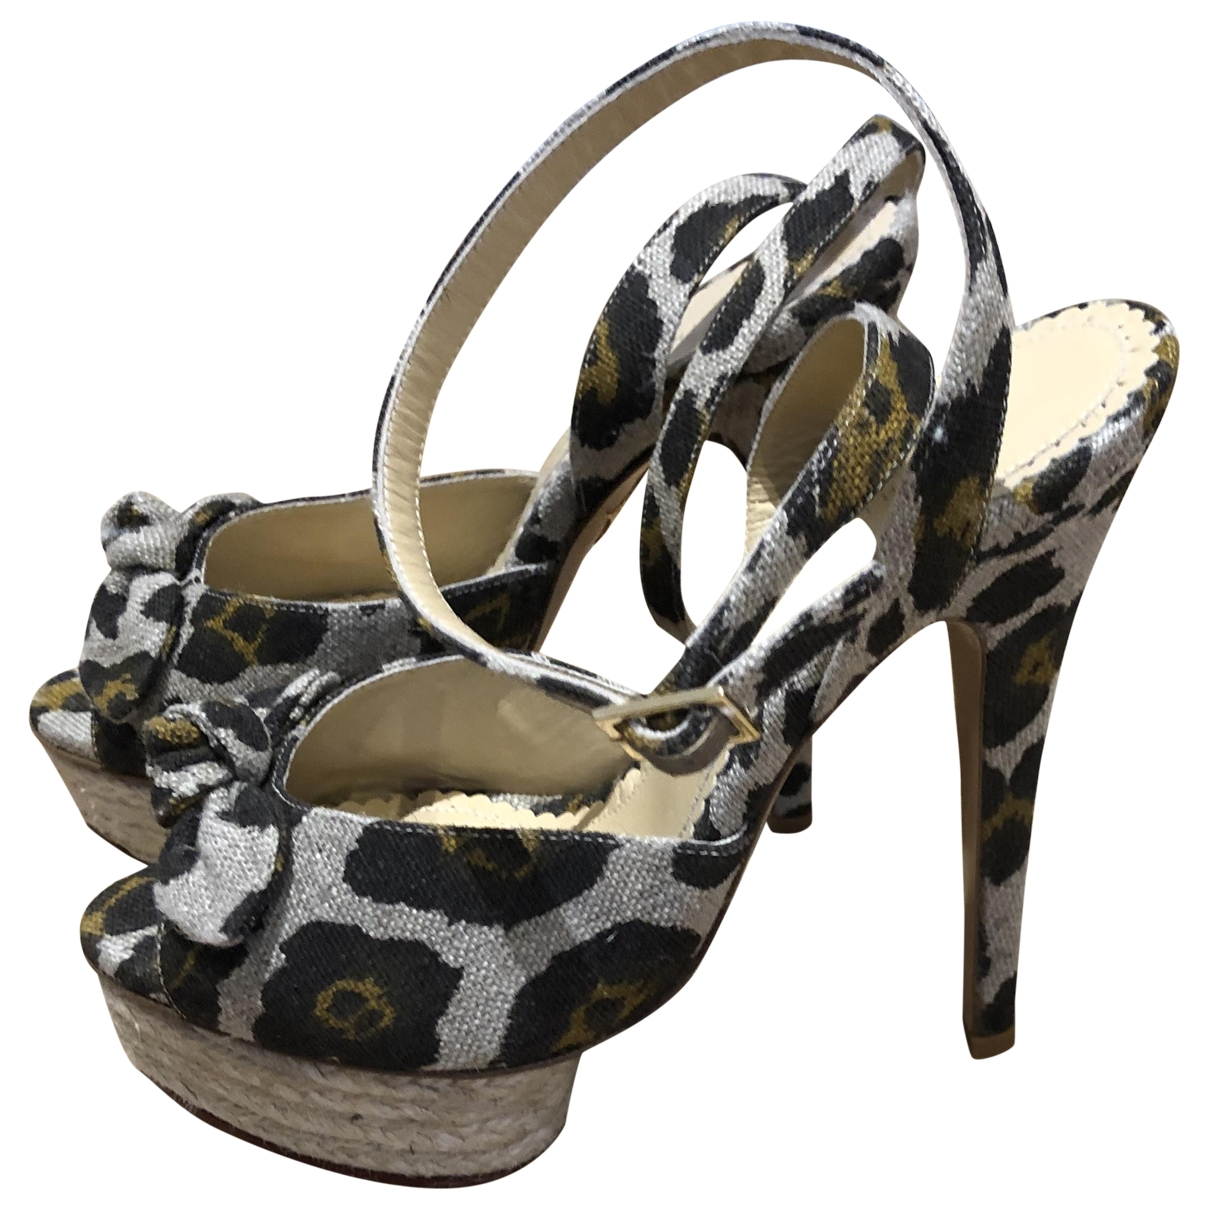 Charlotte Olympia \N Beige Cloth Sandals for Women 37 EU